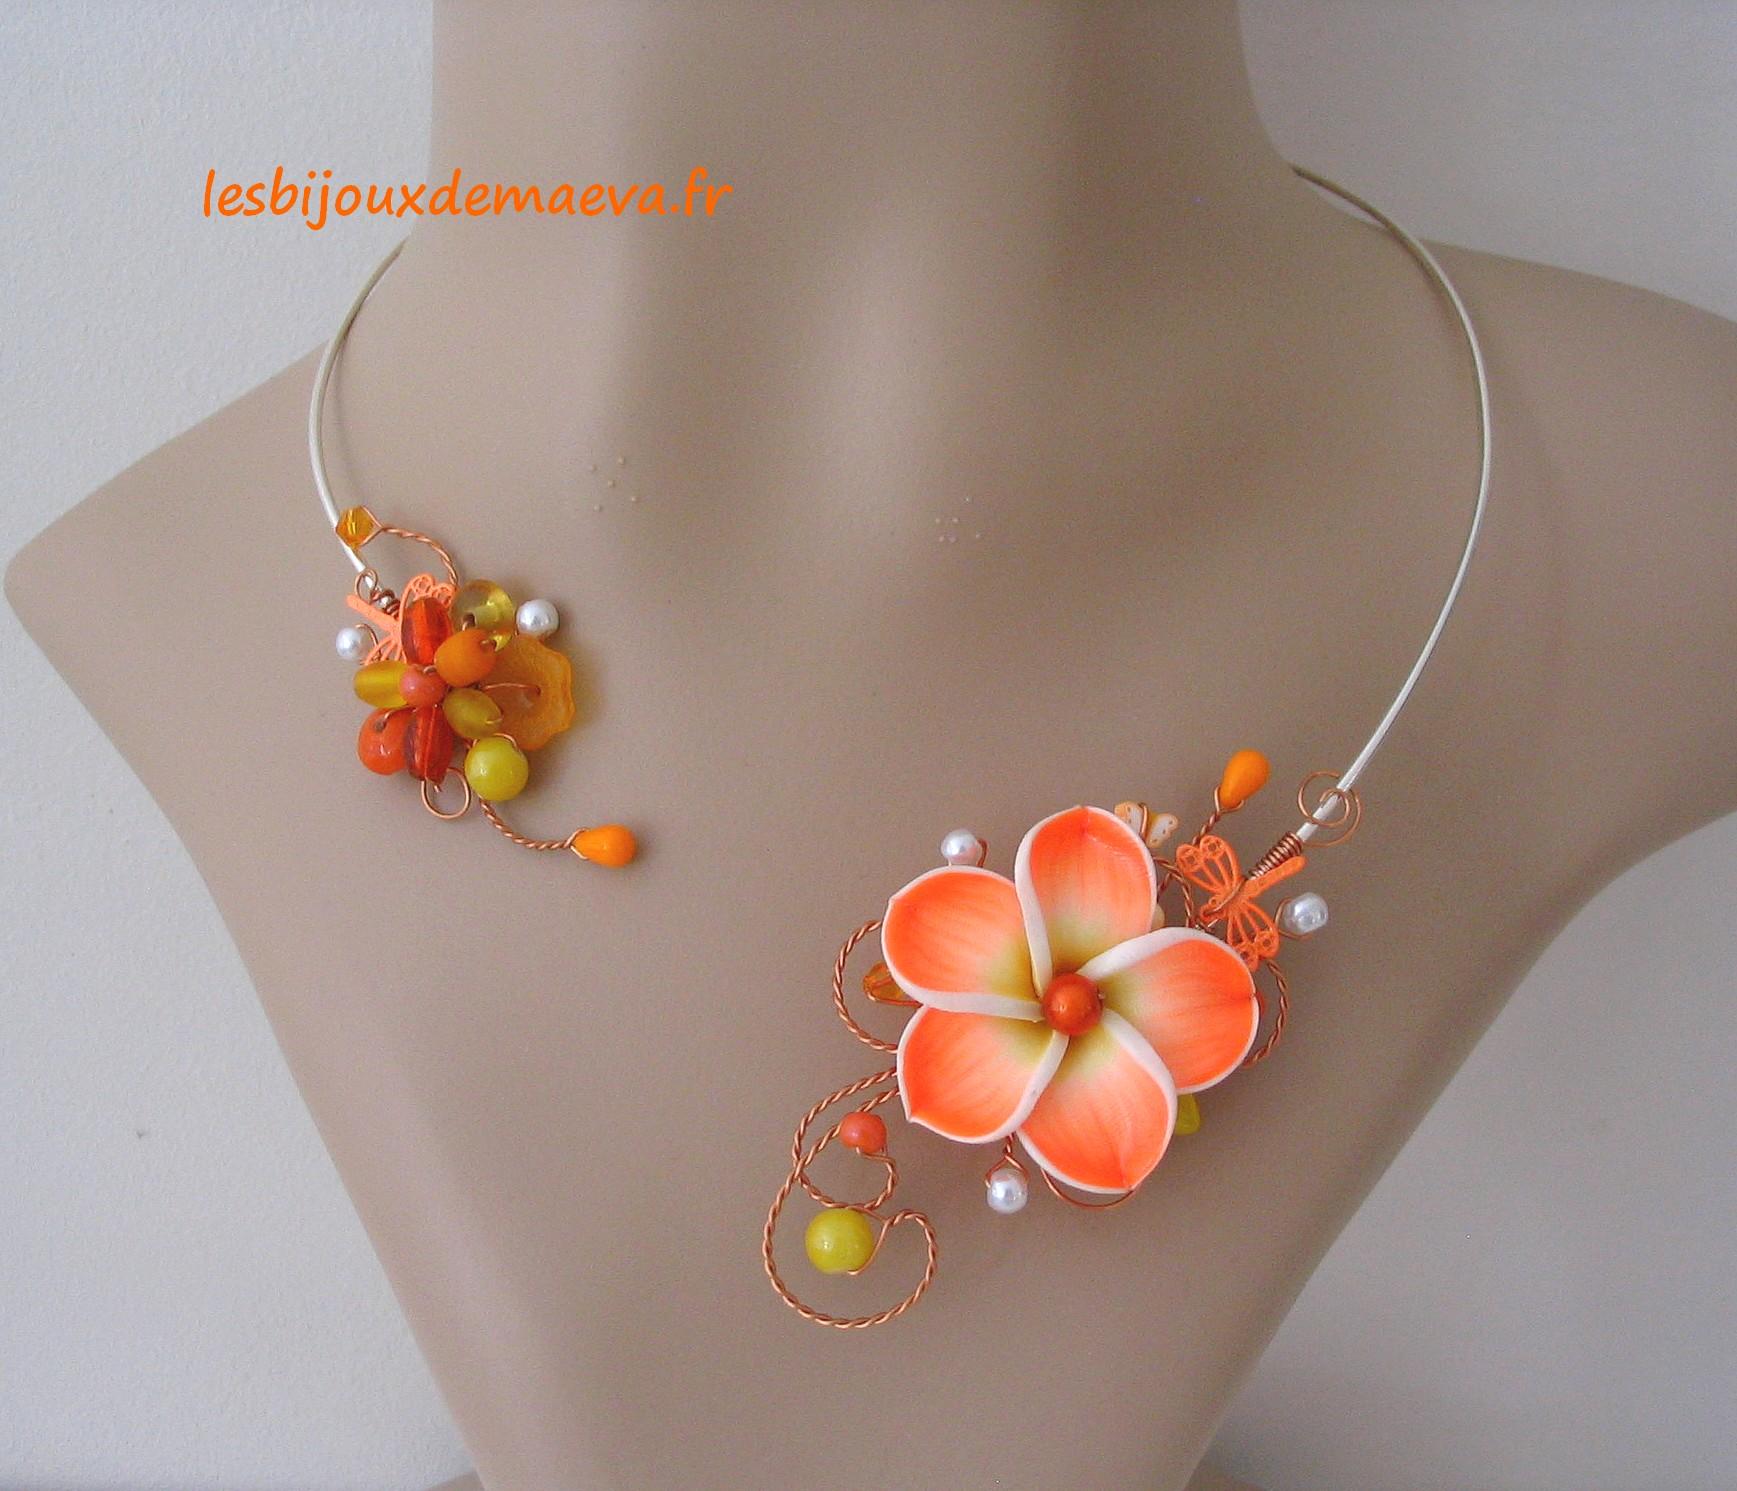 3a81f759021 Bijoux fantaisie orange collier ouvert orange et jaune Hawaï